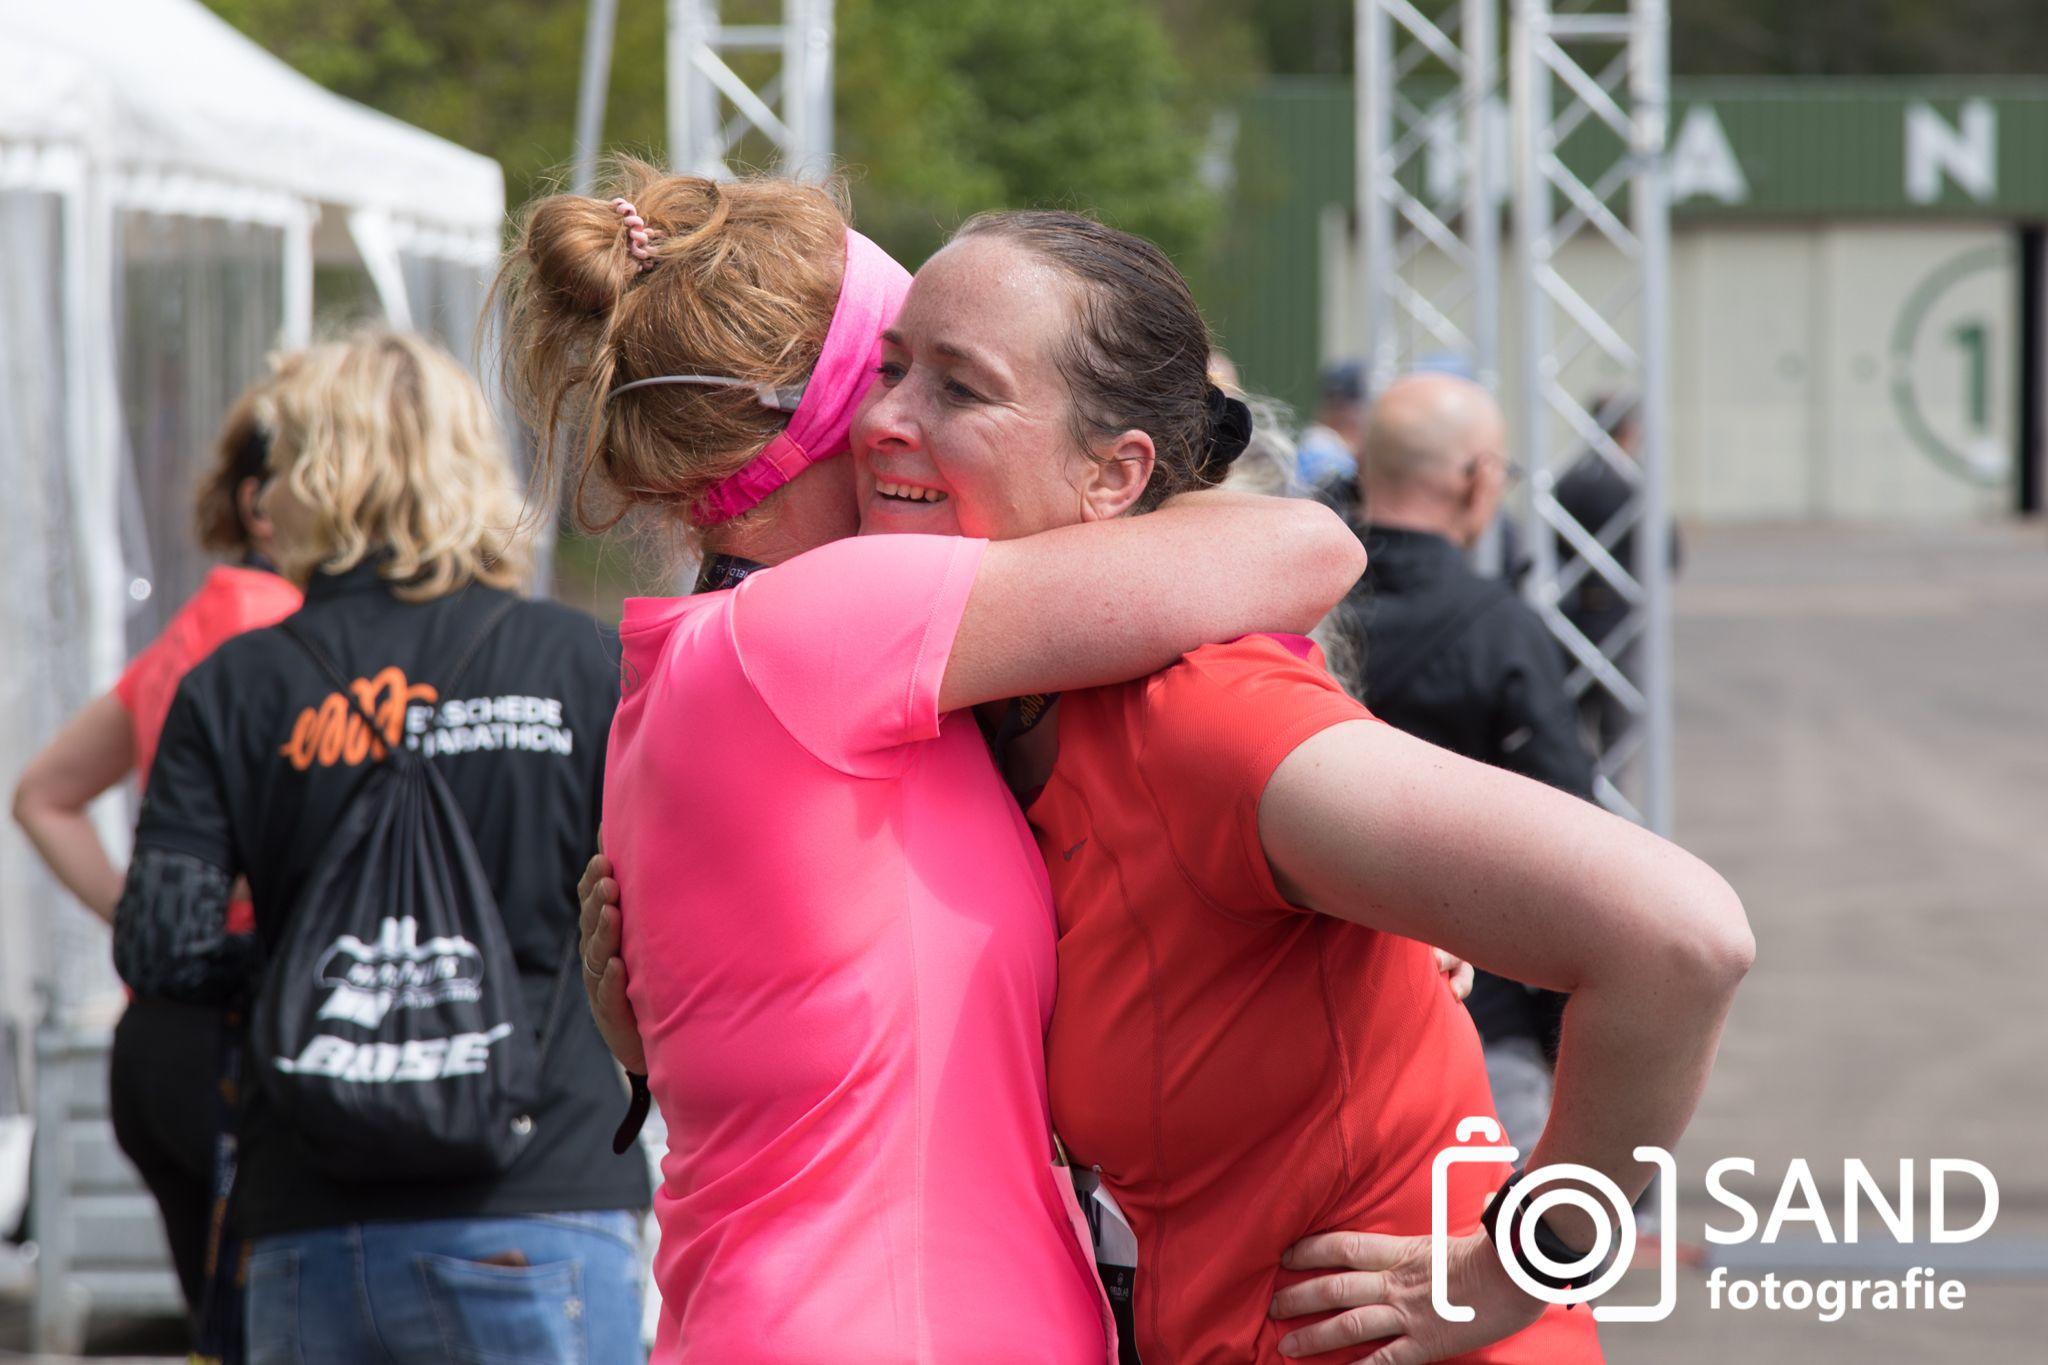 Fieldlab evenement Marathon Enschede op Vliegveld Twenthe 16 mei 2021 Sand Fotografie